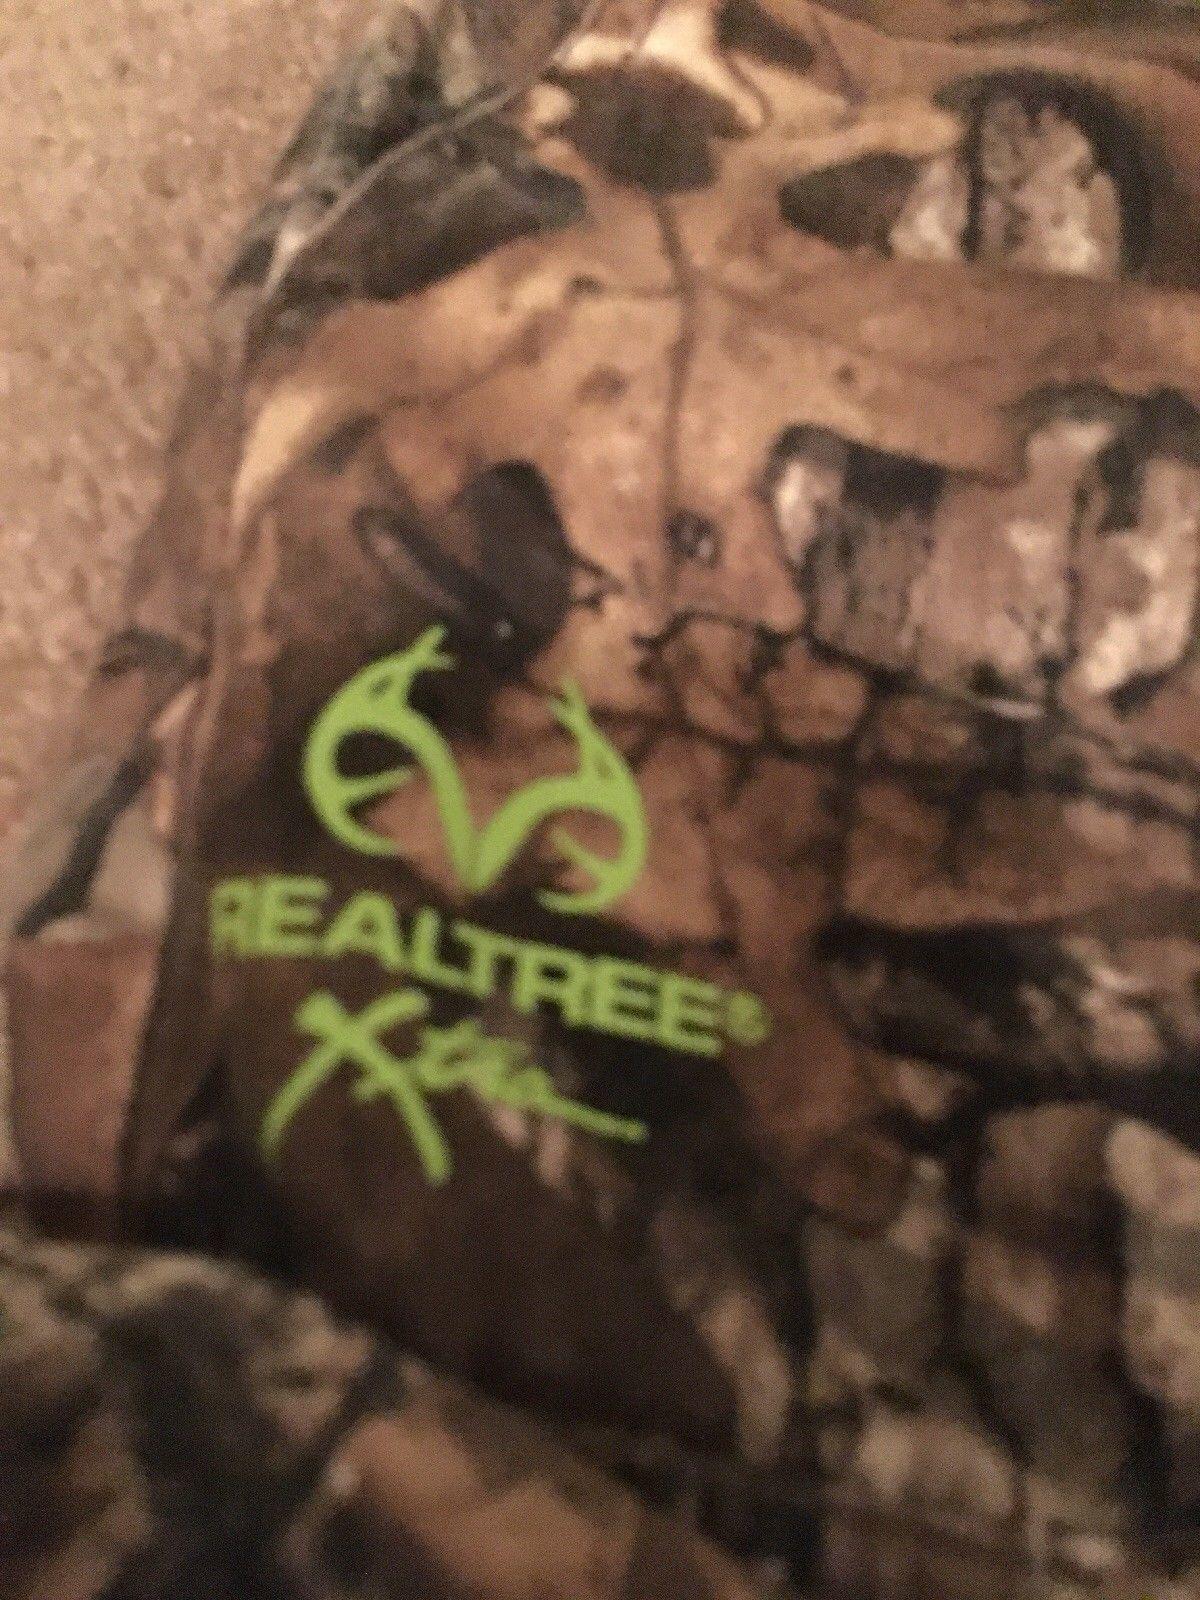 62d4853612e3d Realtree Boy's Hunting Pants Sz XL 14/16 and 50 similar items